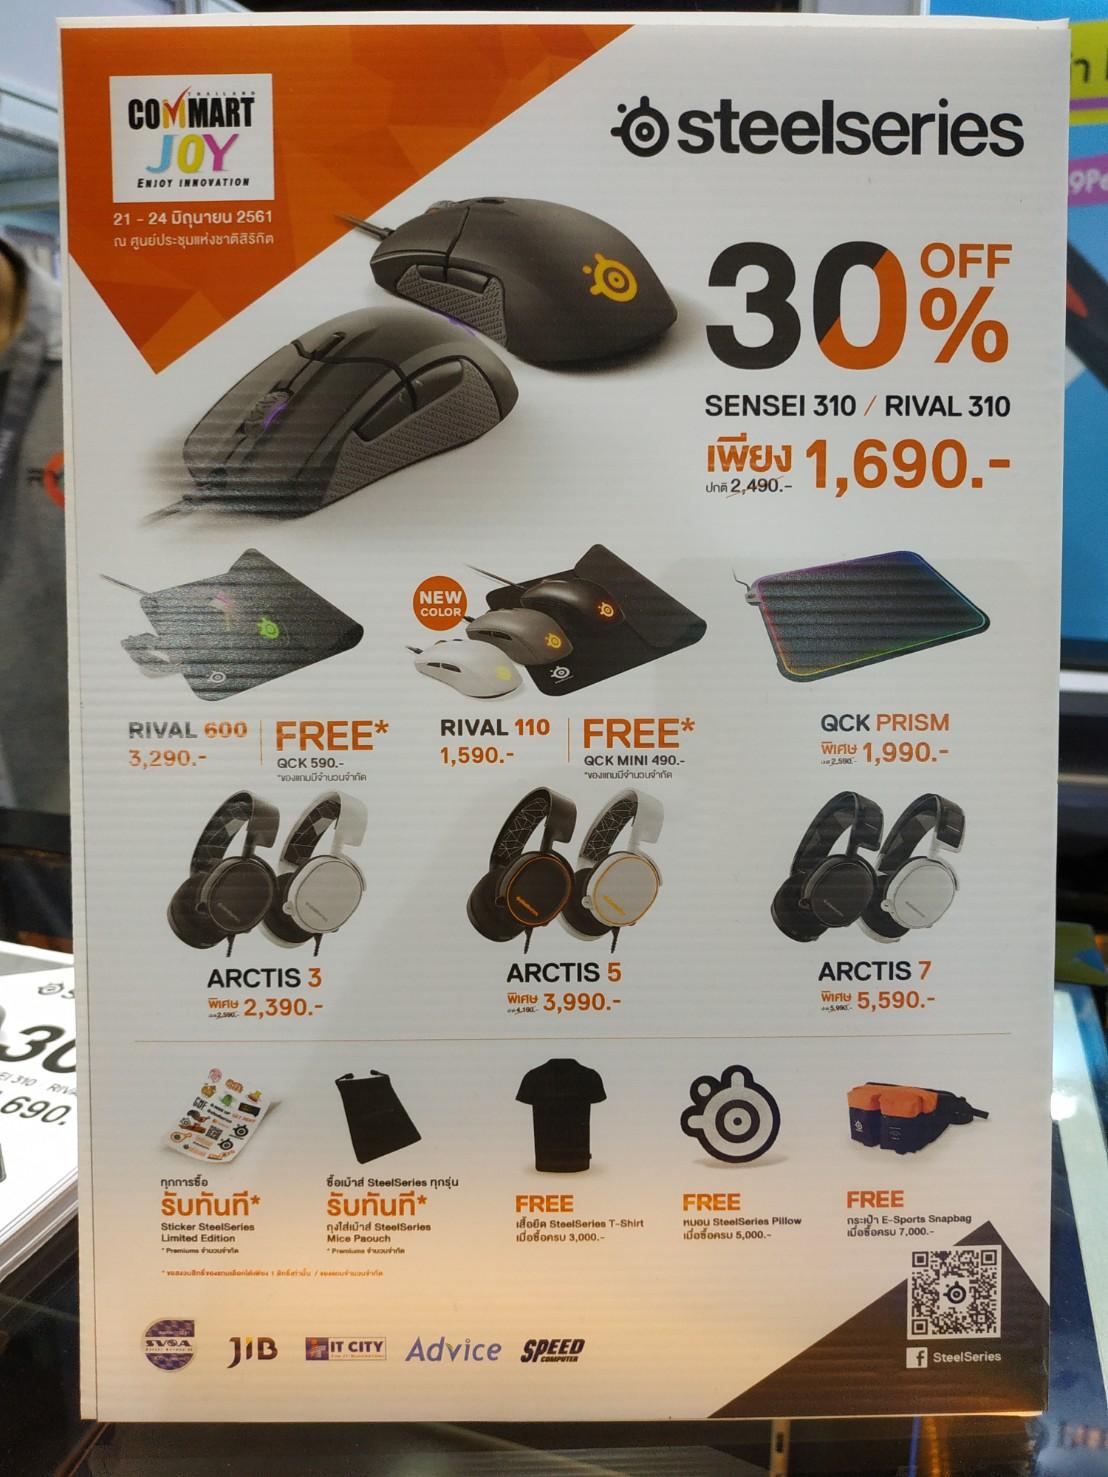 gaming gear commart joy 2018 17